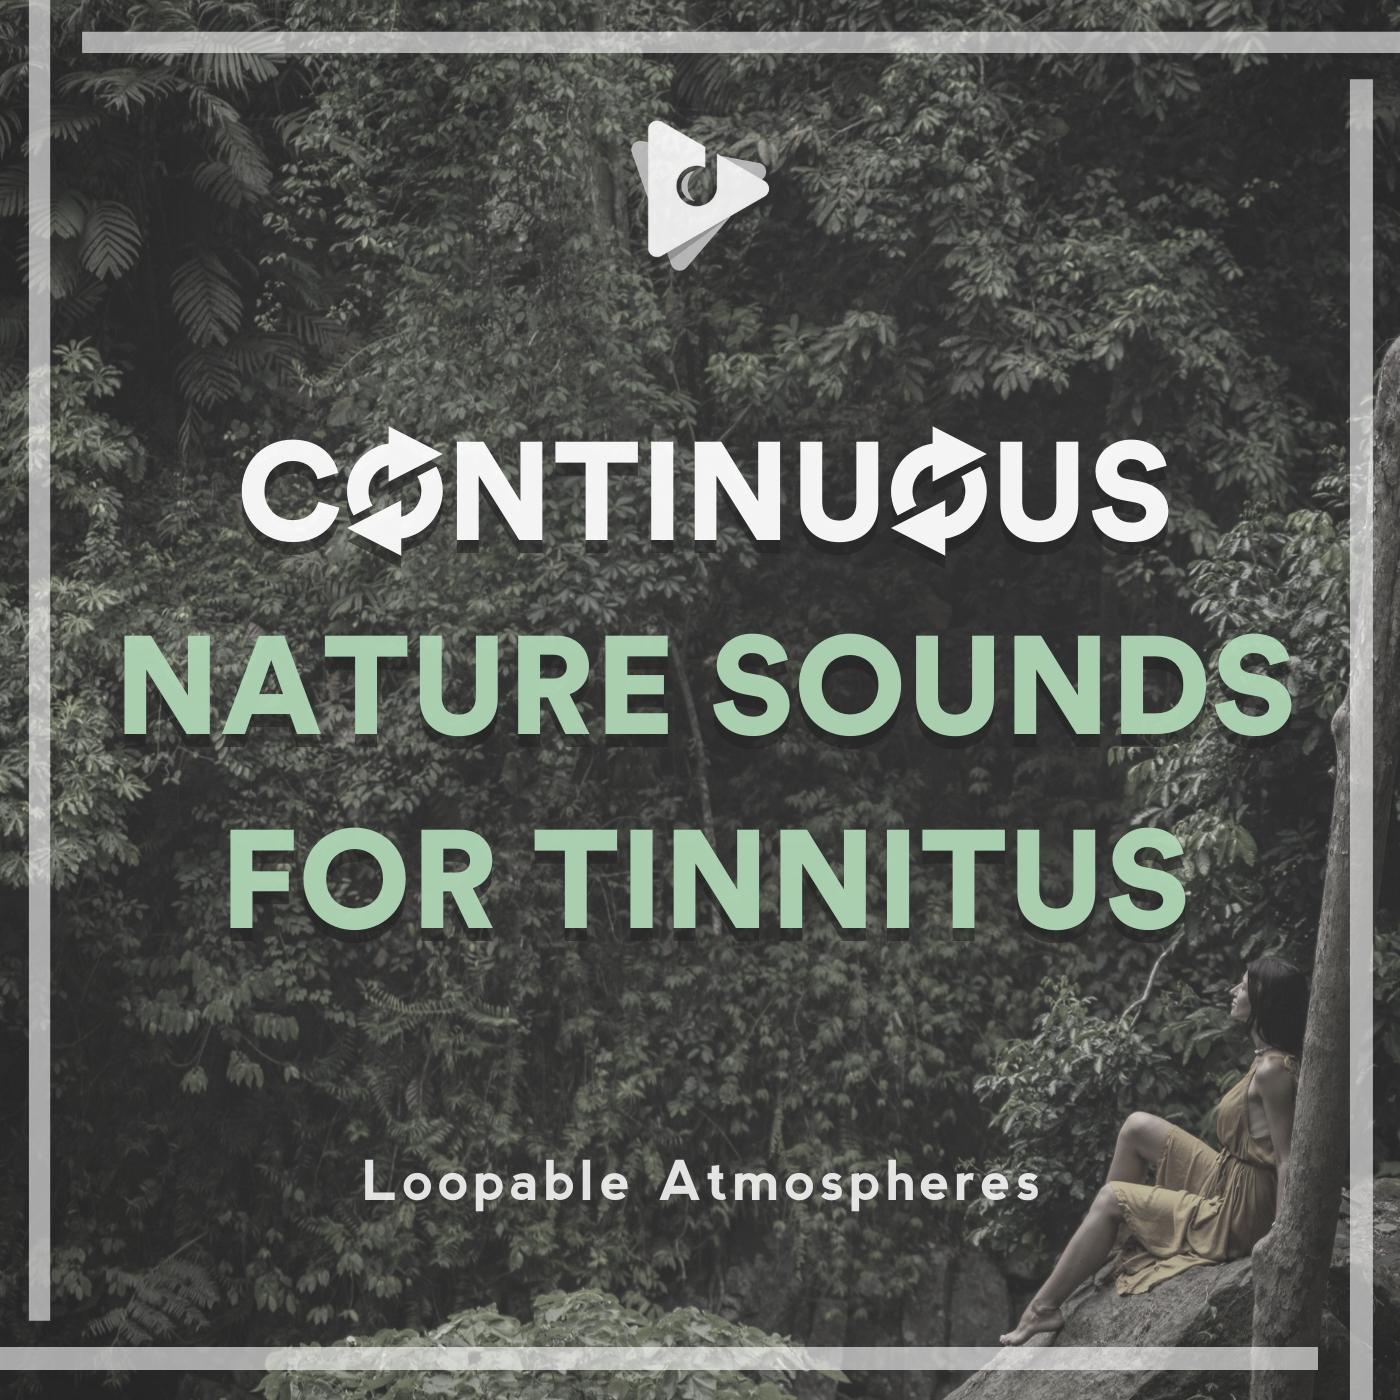 Continuous Nature Sounds for Tinnitus